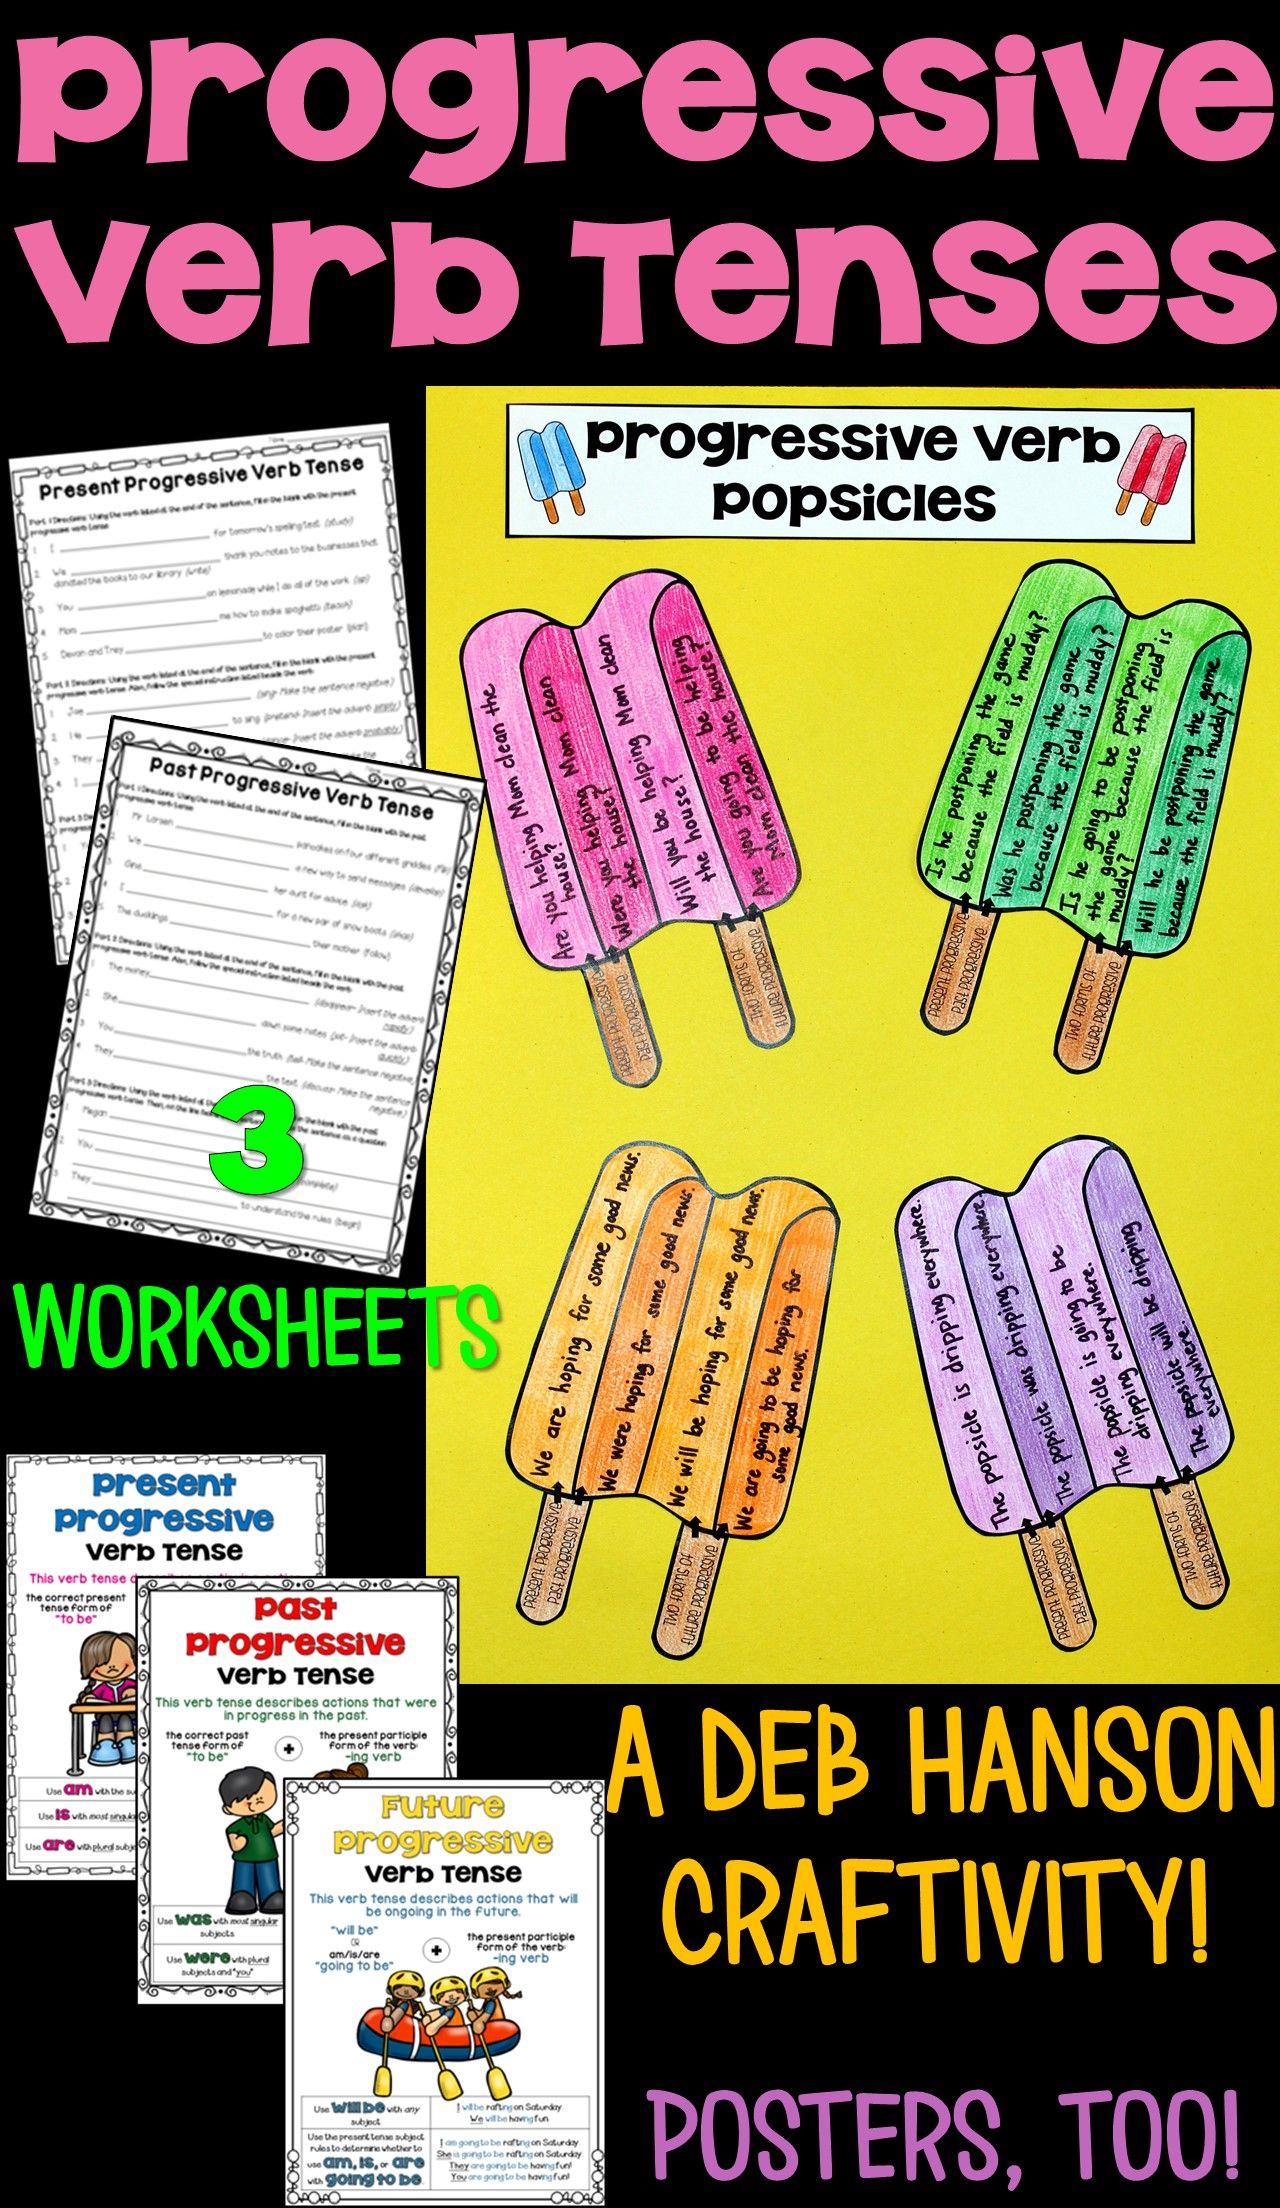 Progressive Verbs Worksheets Craftivity Posters 4th Grade